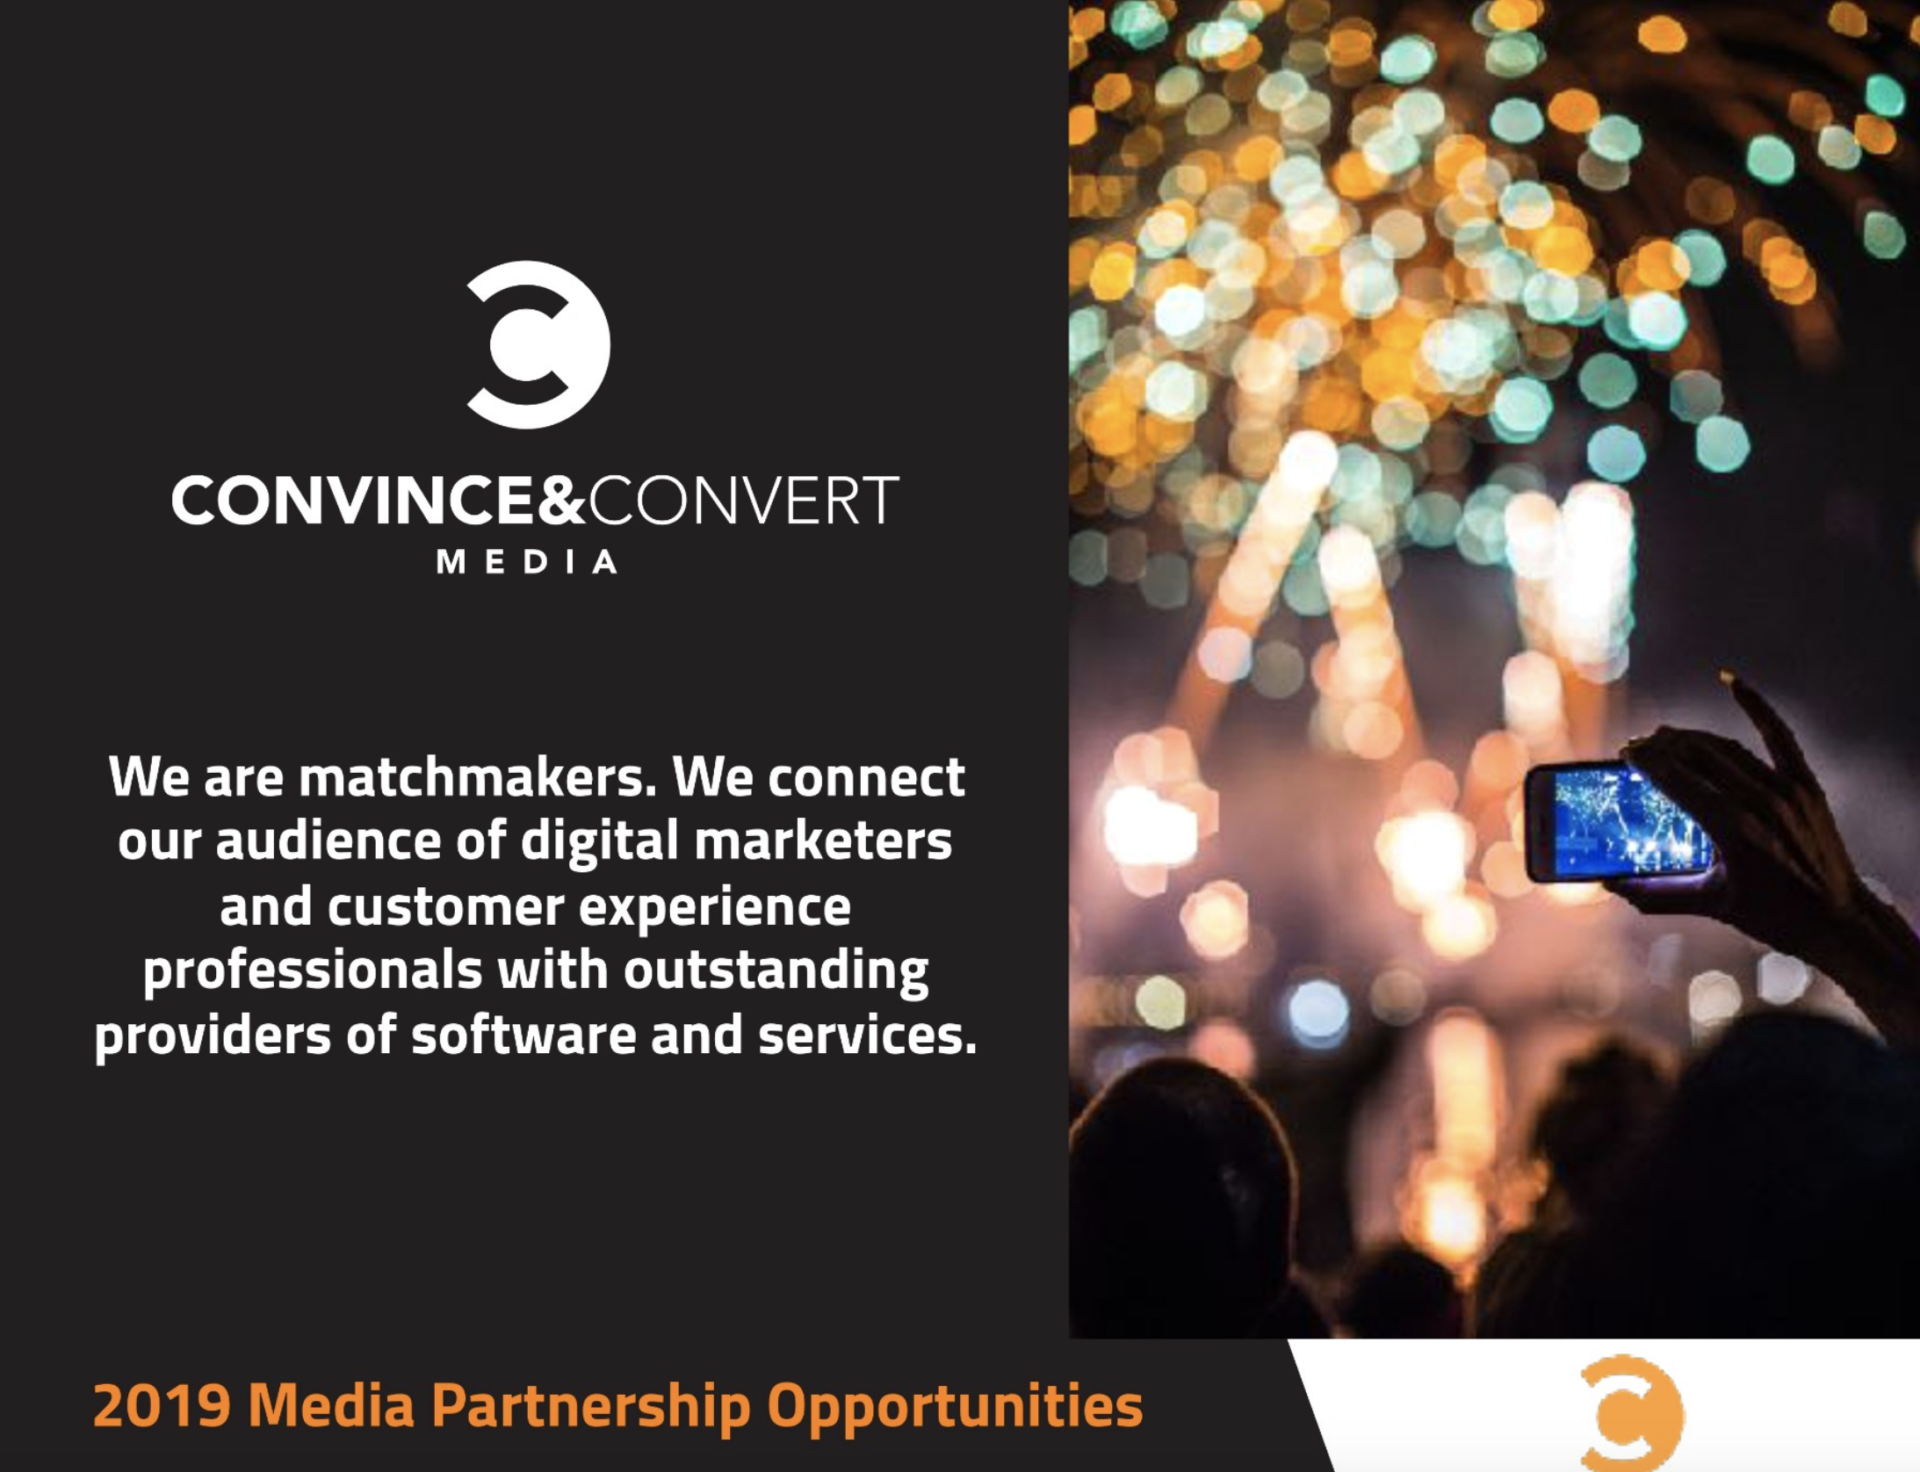 convince convert media